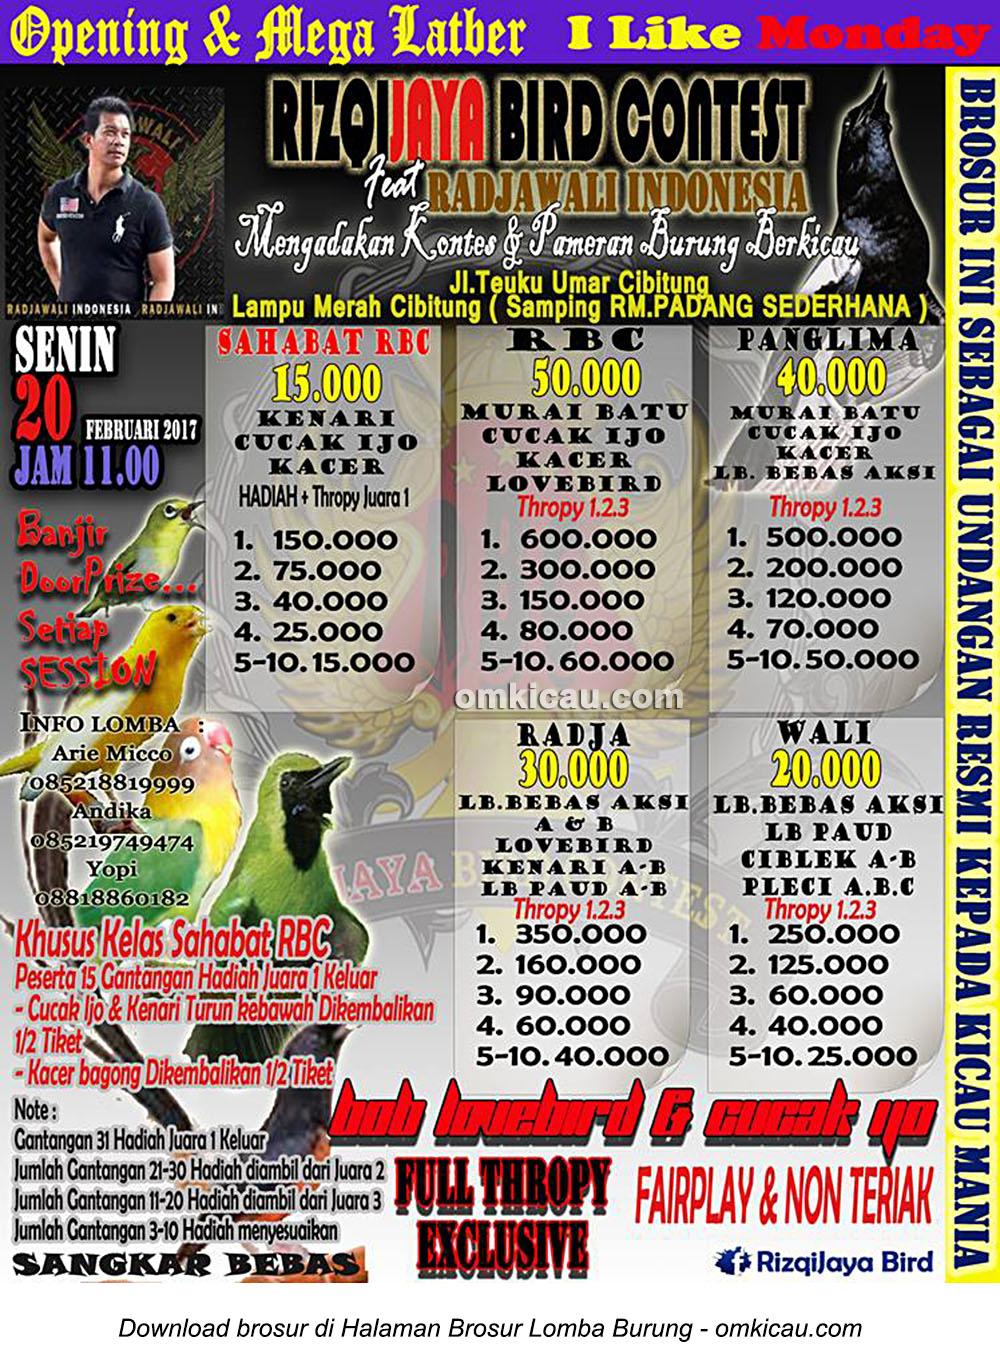 Brosur Mega Latber RizqiJaya Bird Contest feat Radjawali Indonesia, Bekasi, 20 Februari 2017